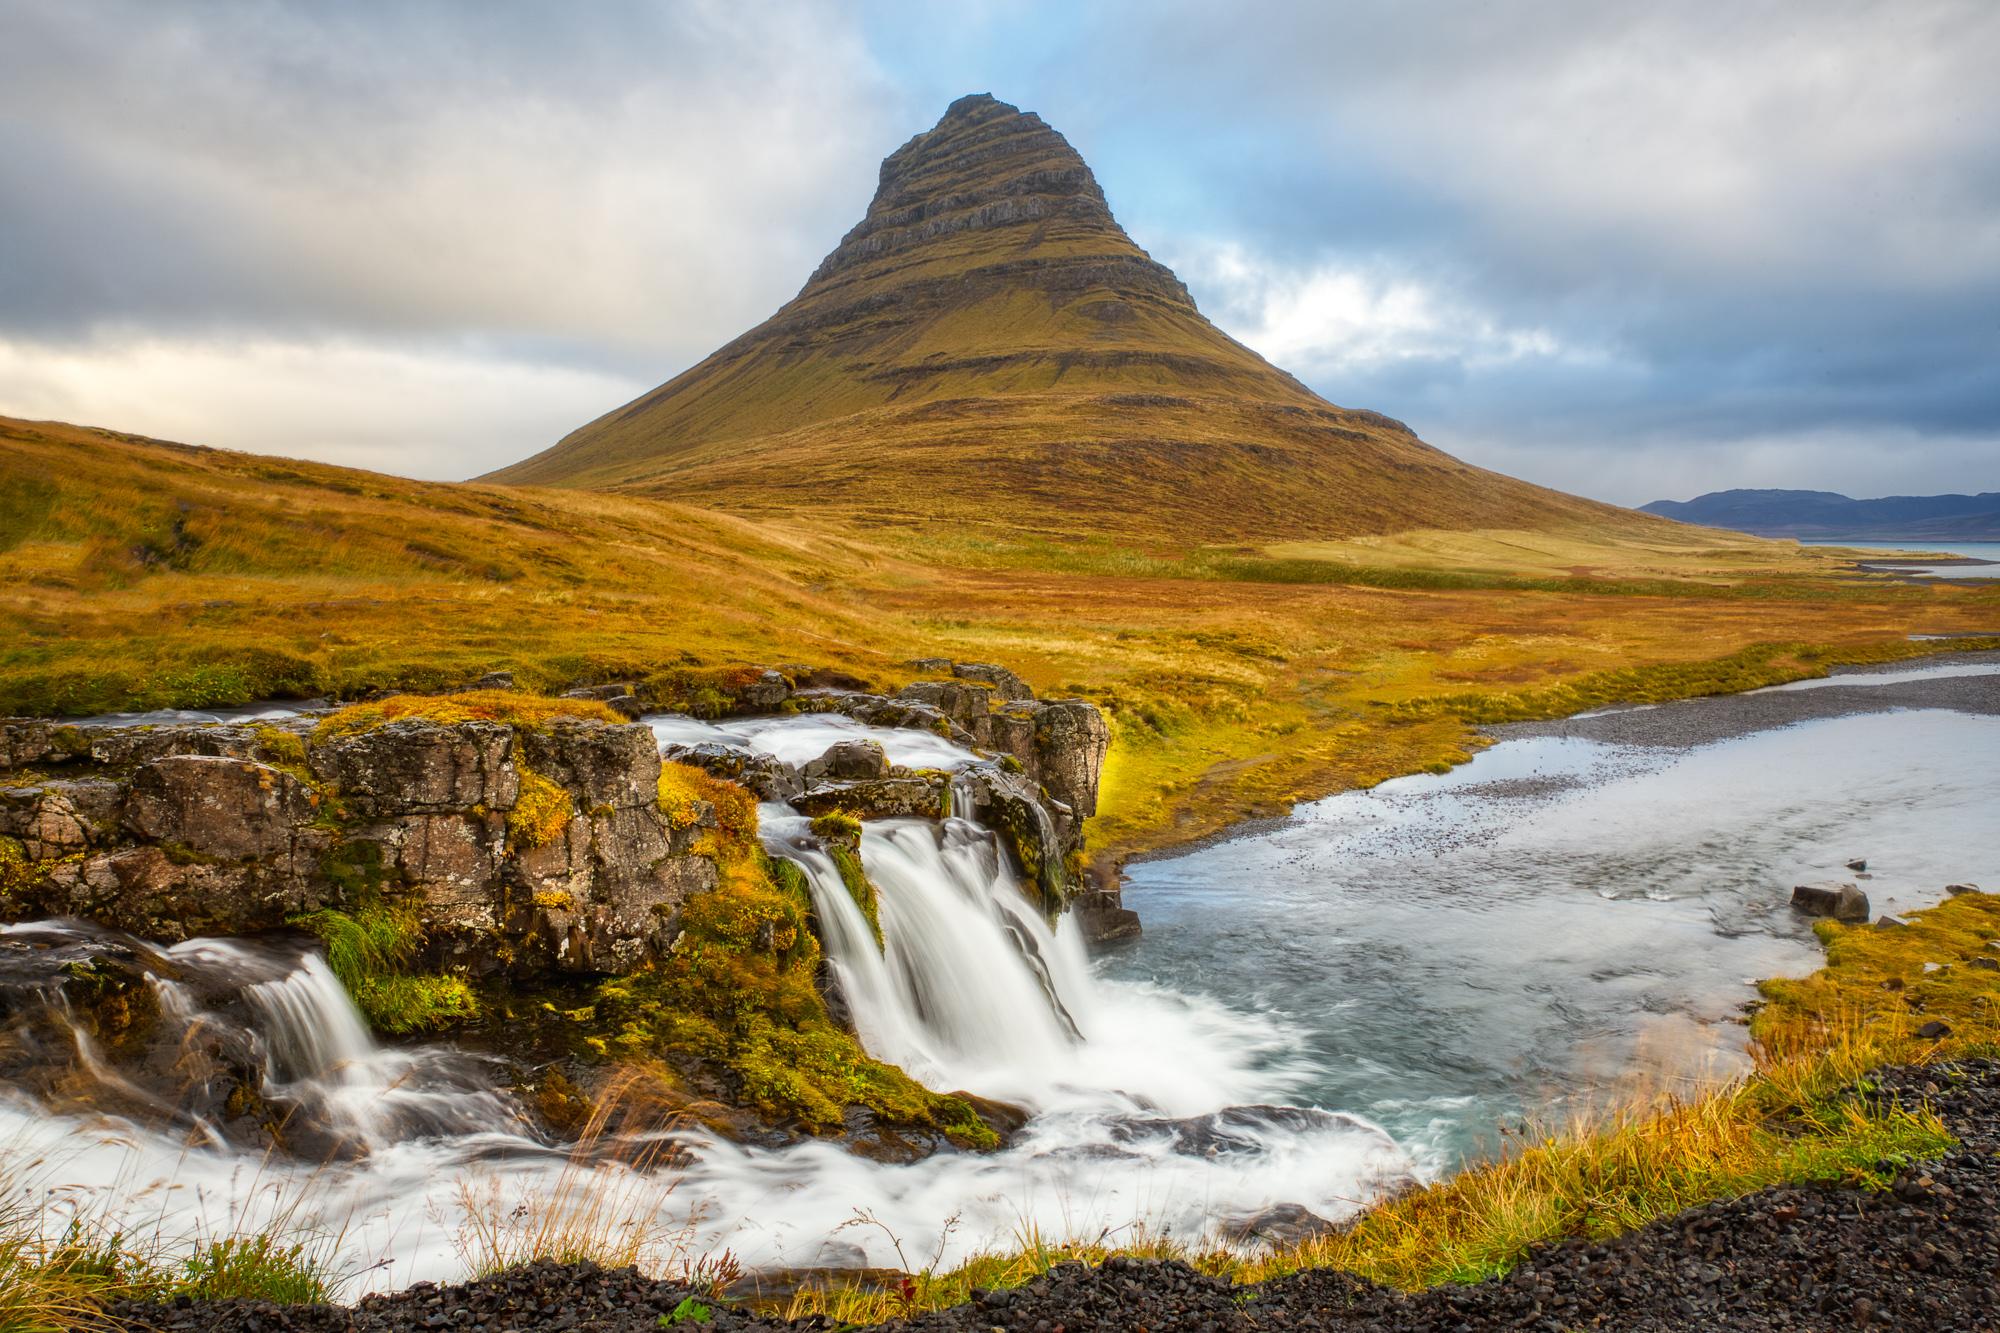 fotos-islandia-419_AuroraHDR2019-edit.jpg